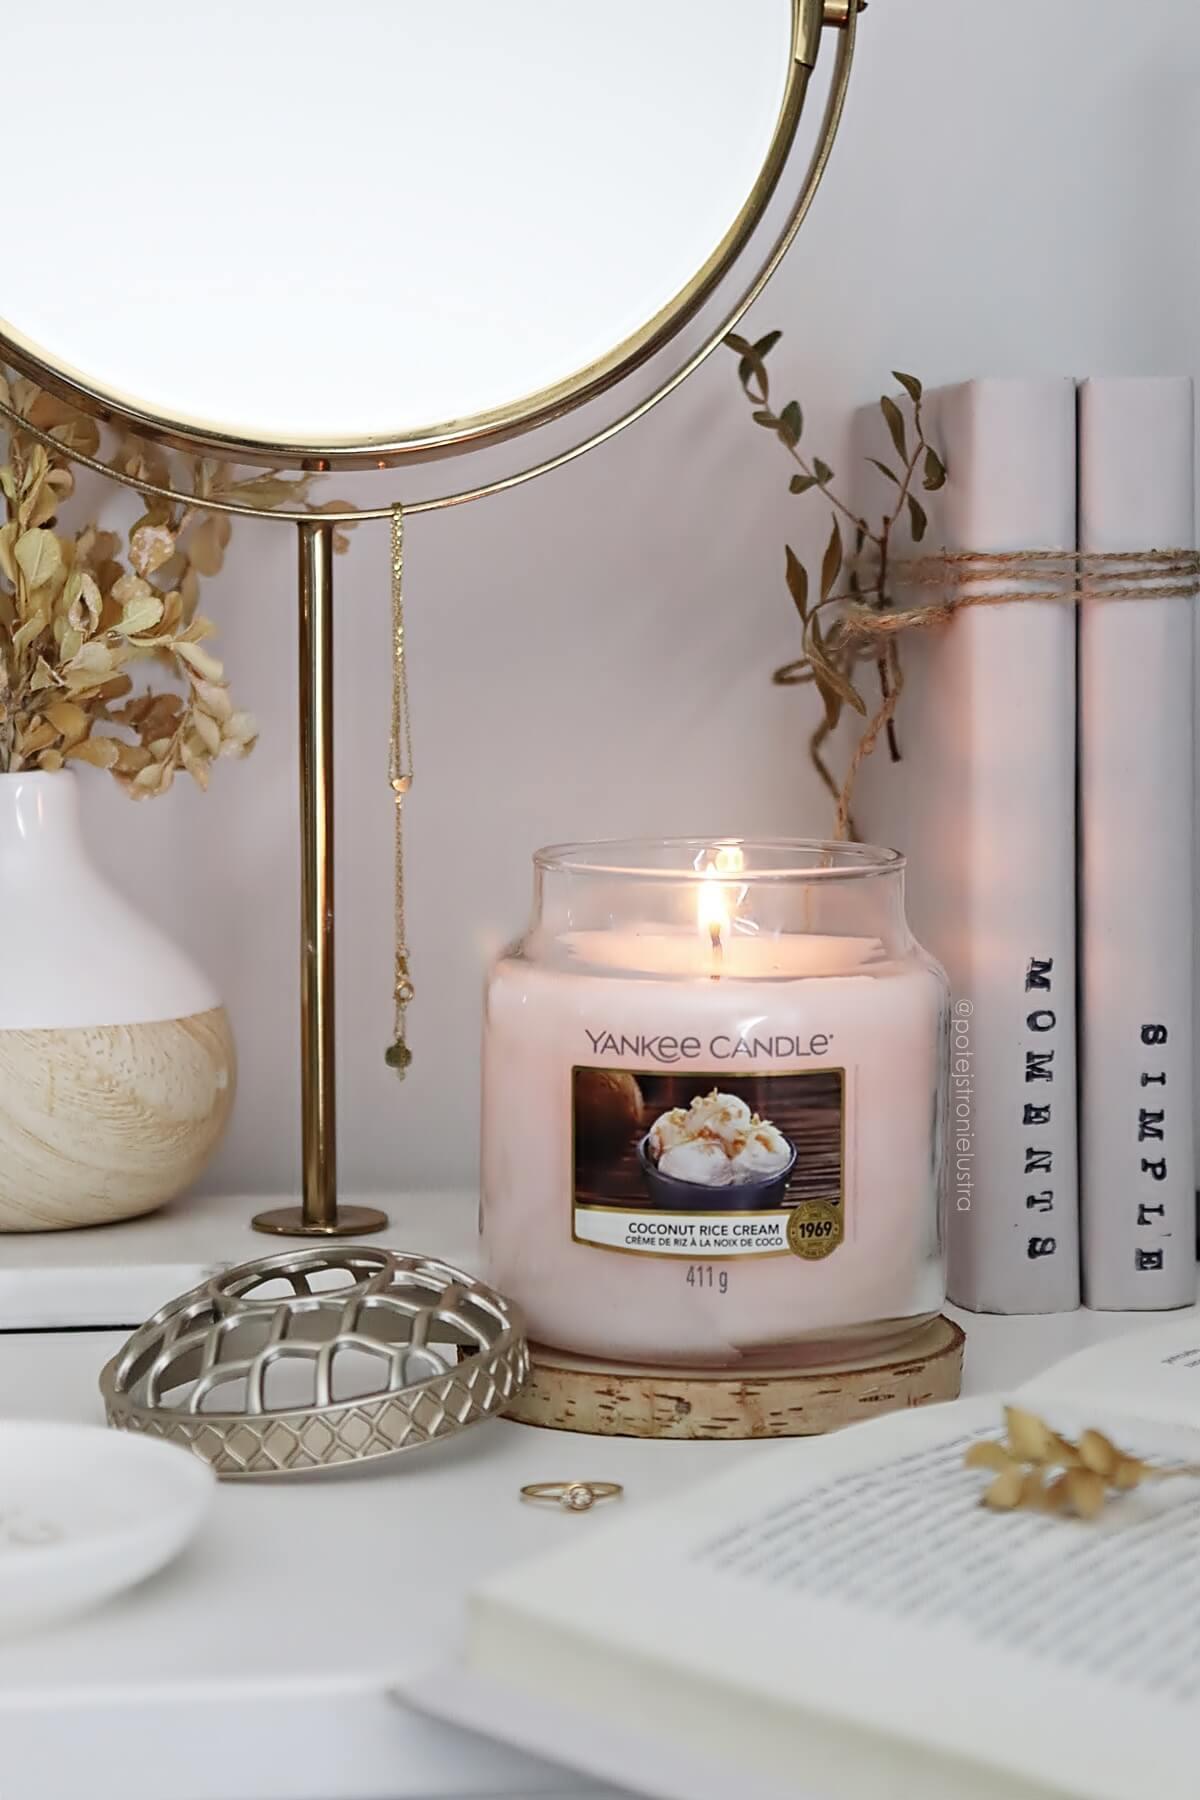 coconut rice cream nowy zapach yankee candle na wiosnę 2021